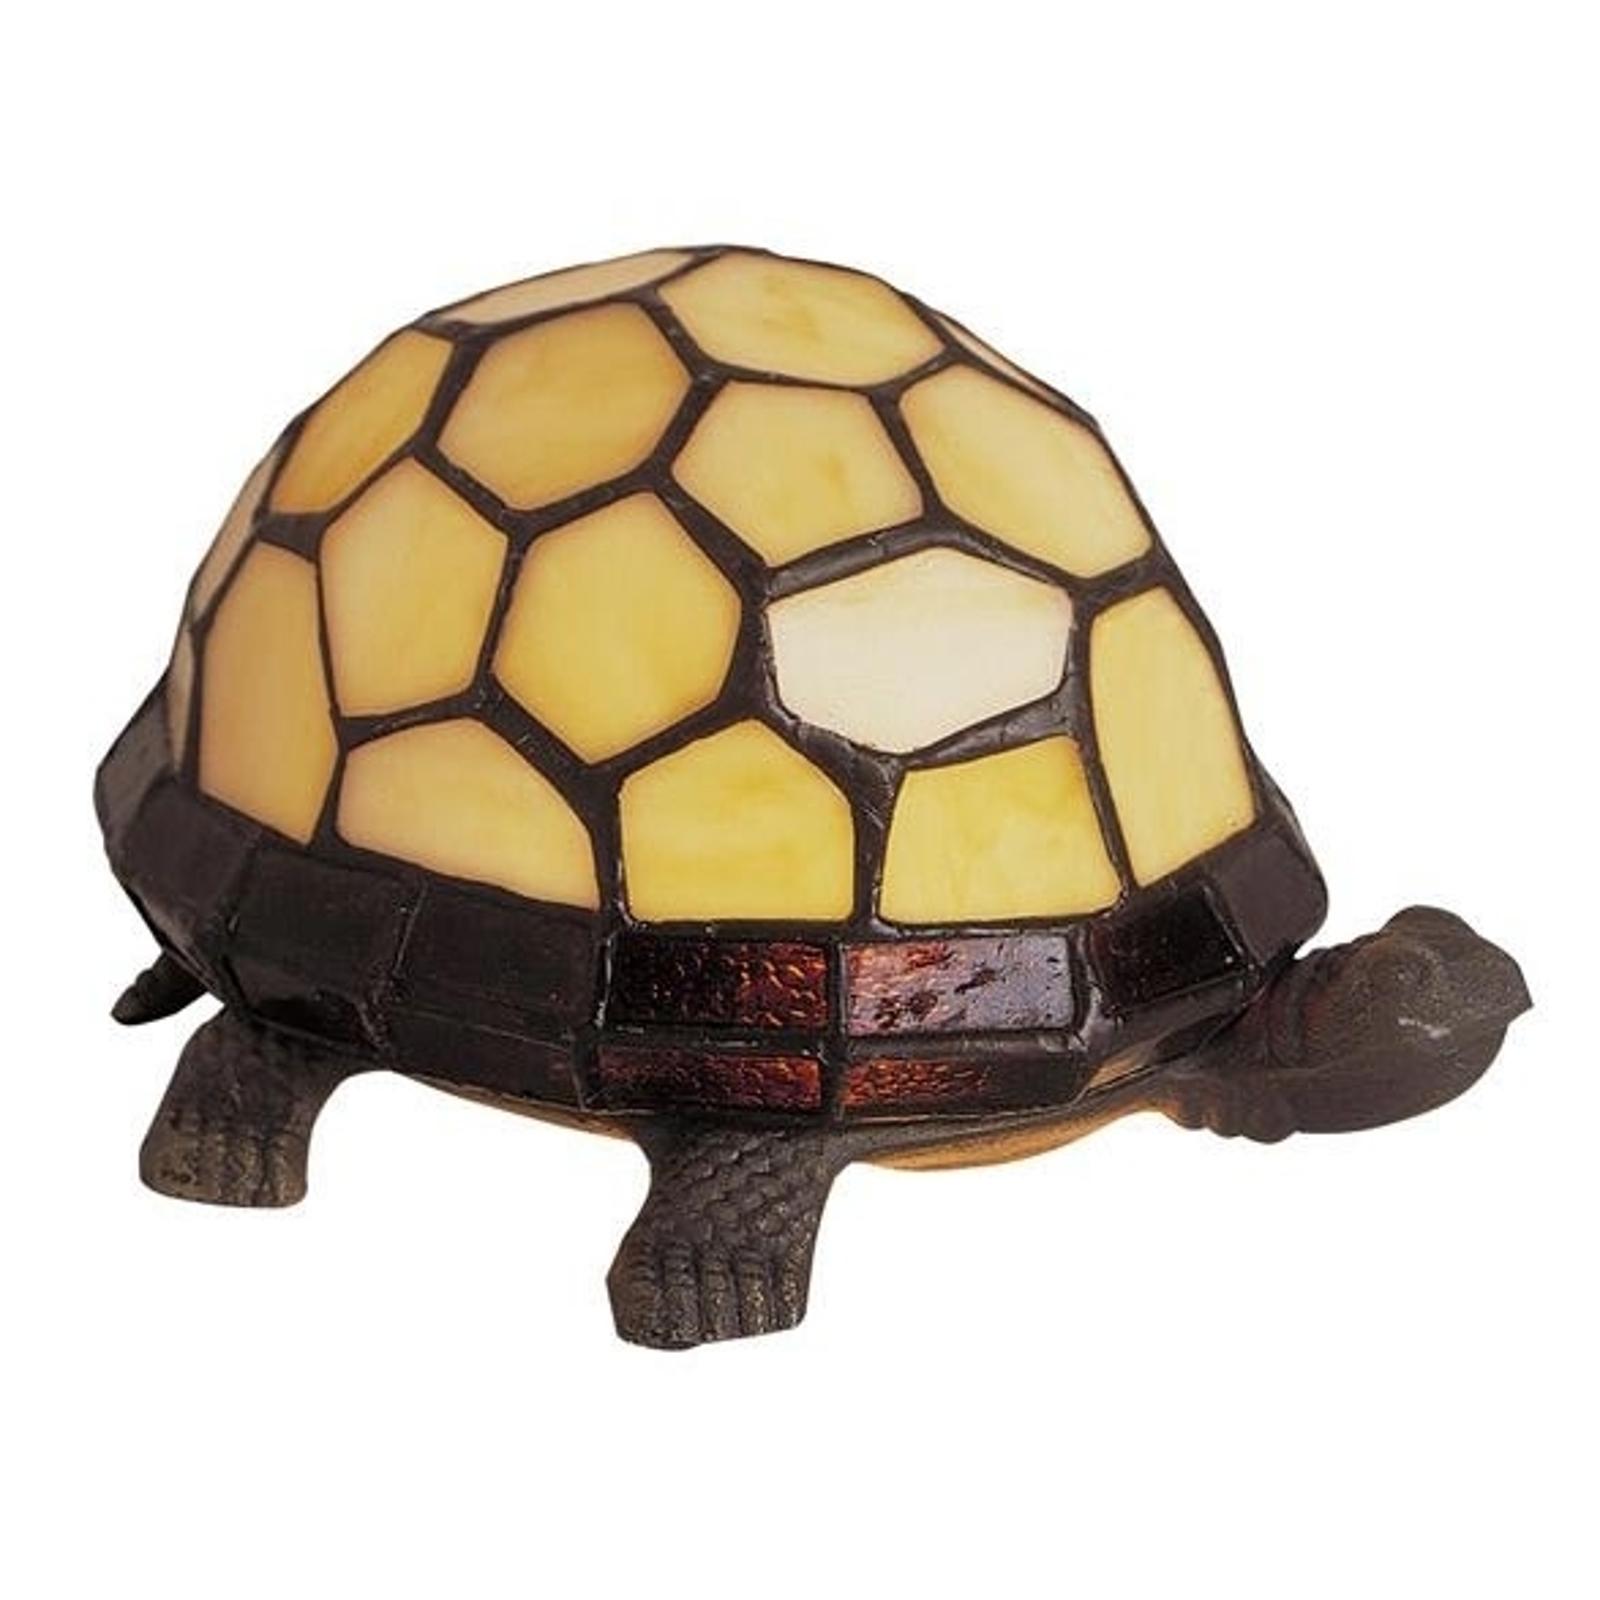 TORTUE - lámpara de mesa de tortuga